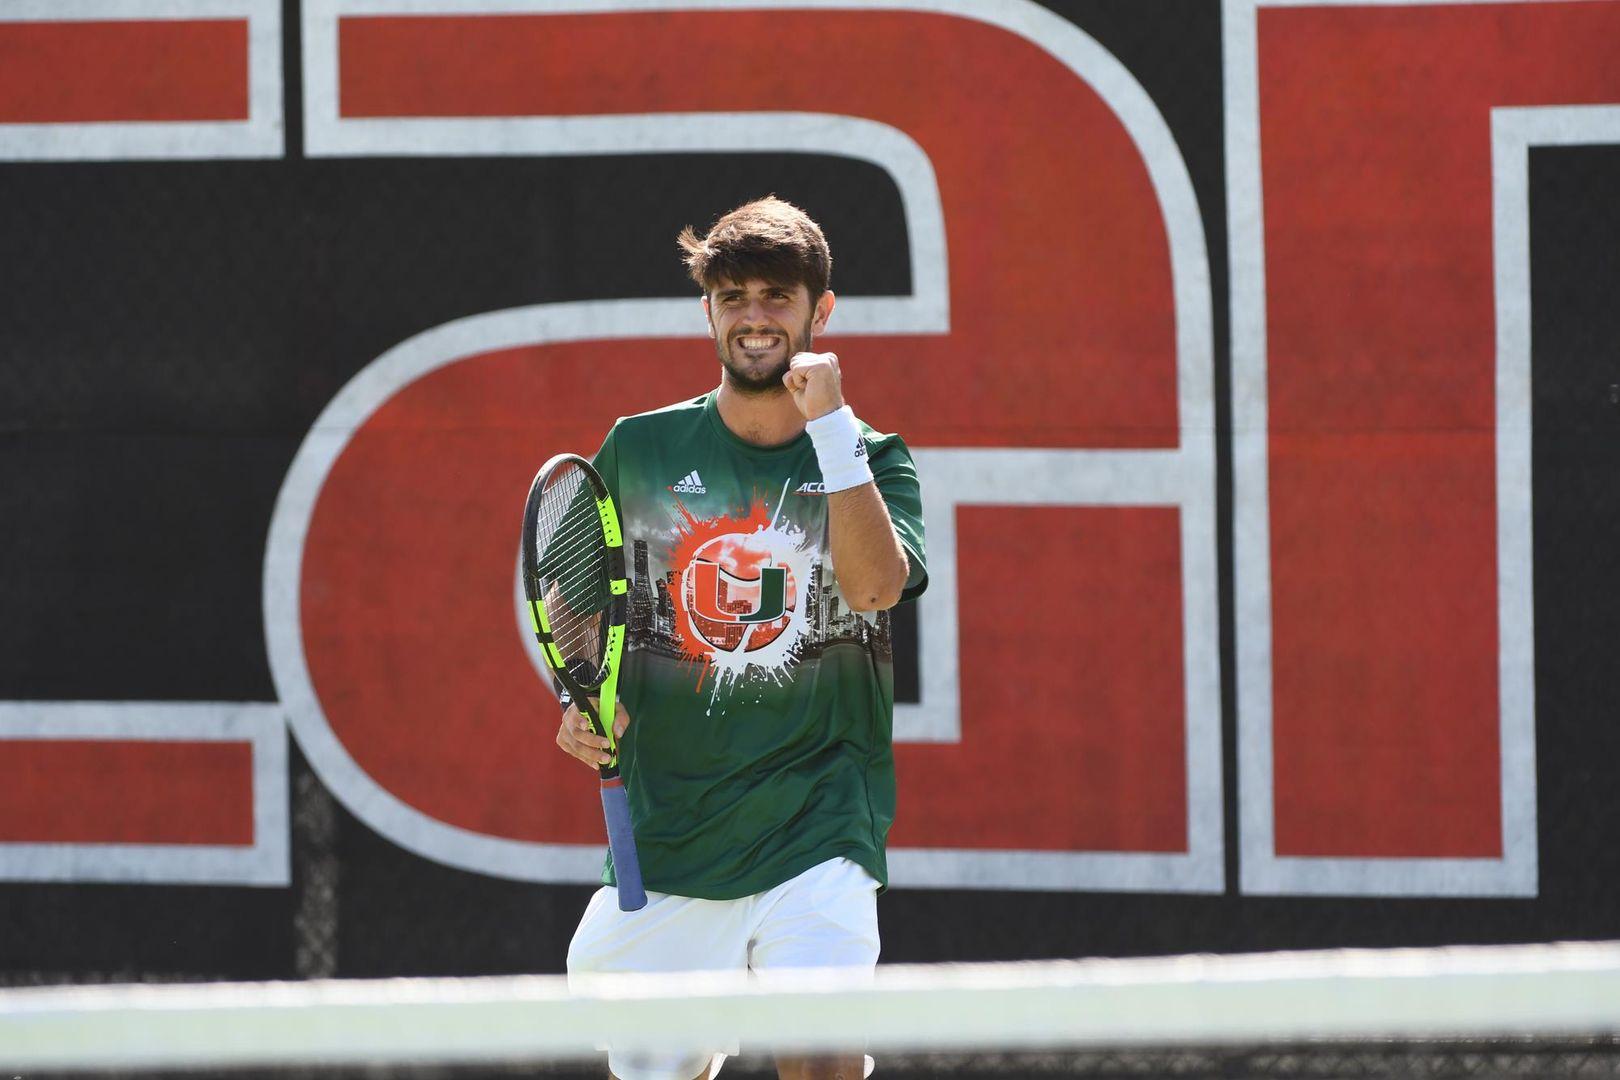 Miami Men's Tennis Rolls Past FAU, 4-2